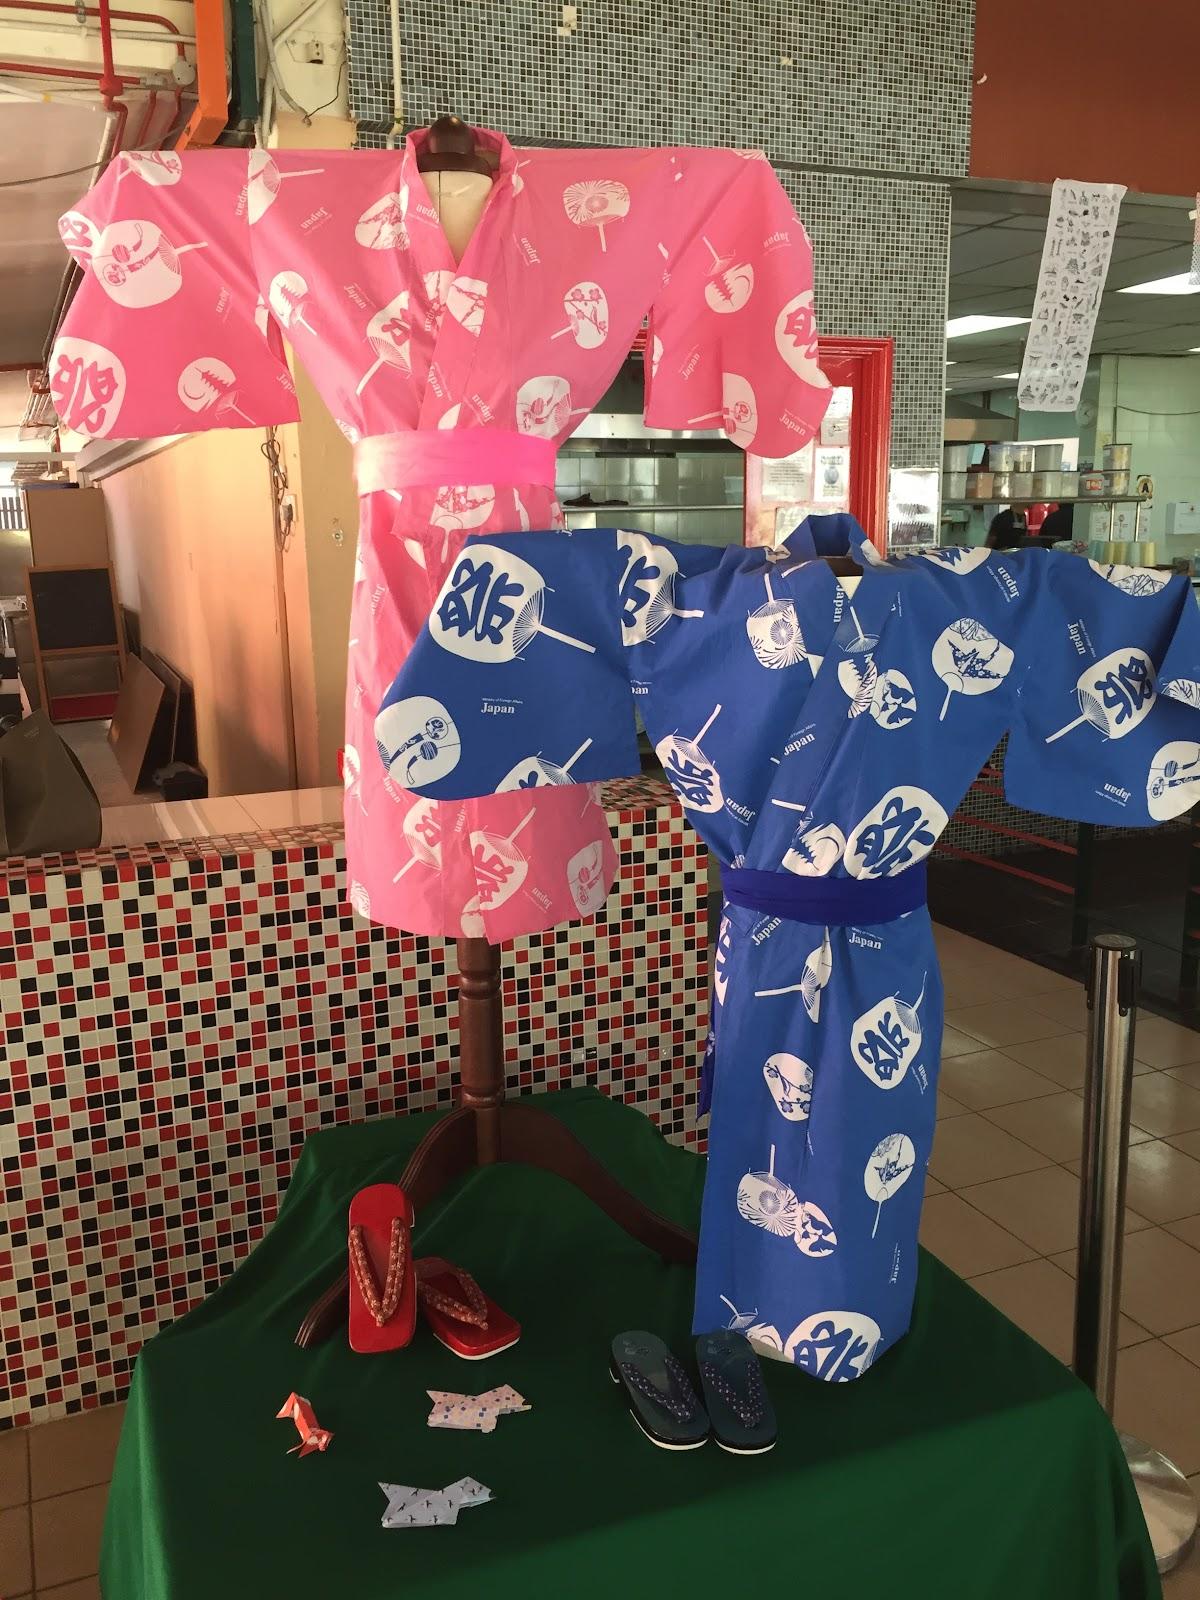 Celebrating our diversity! Japan 💮